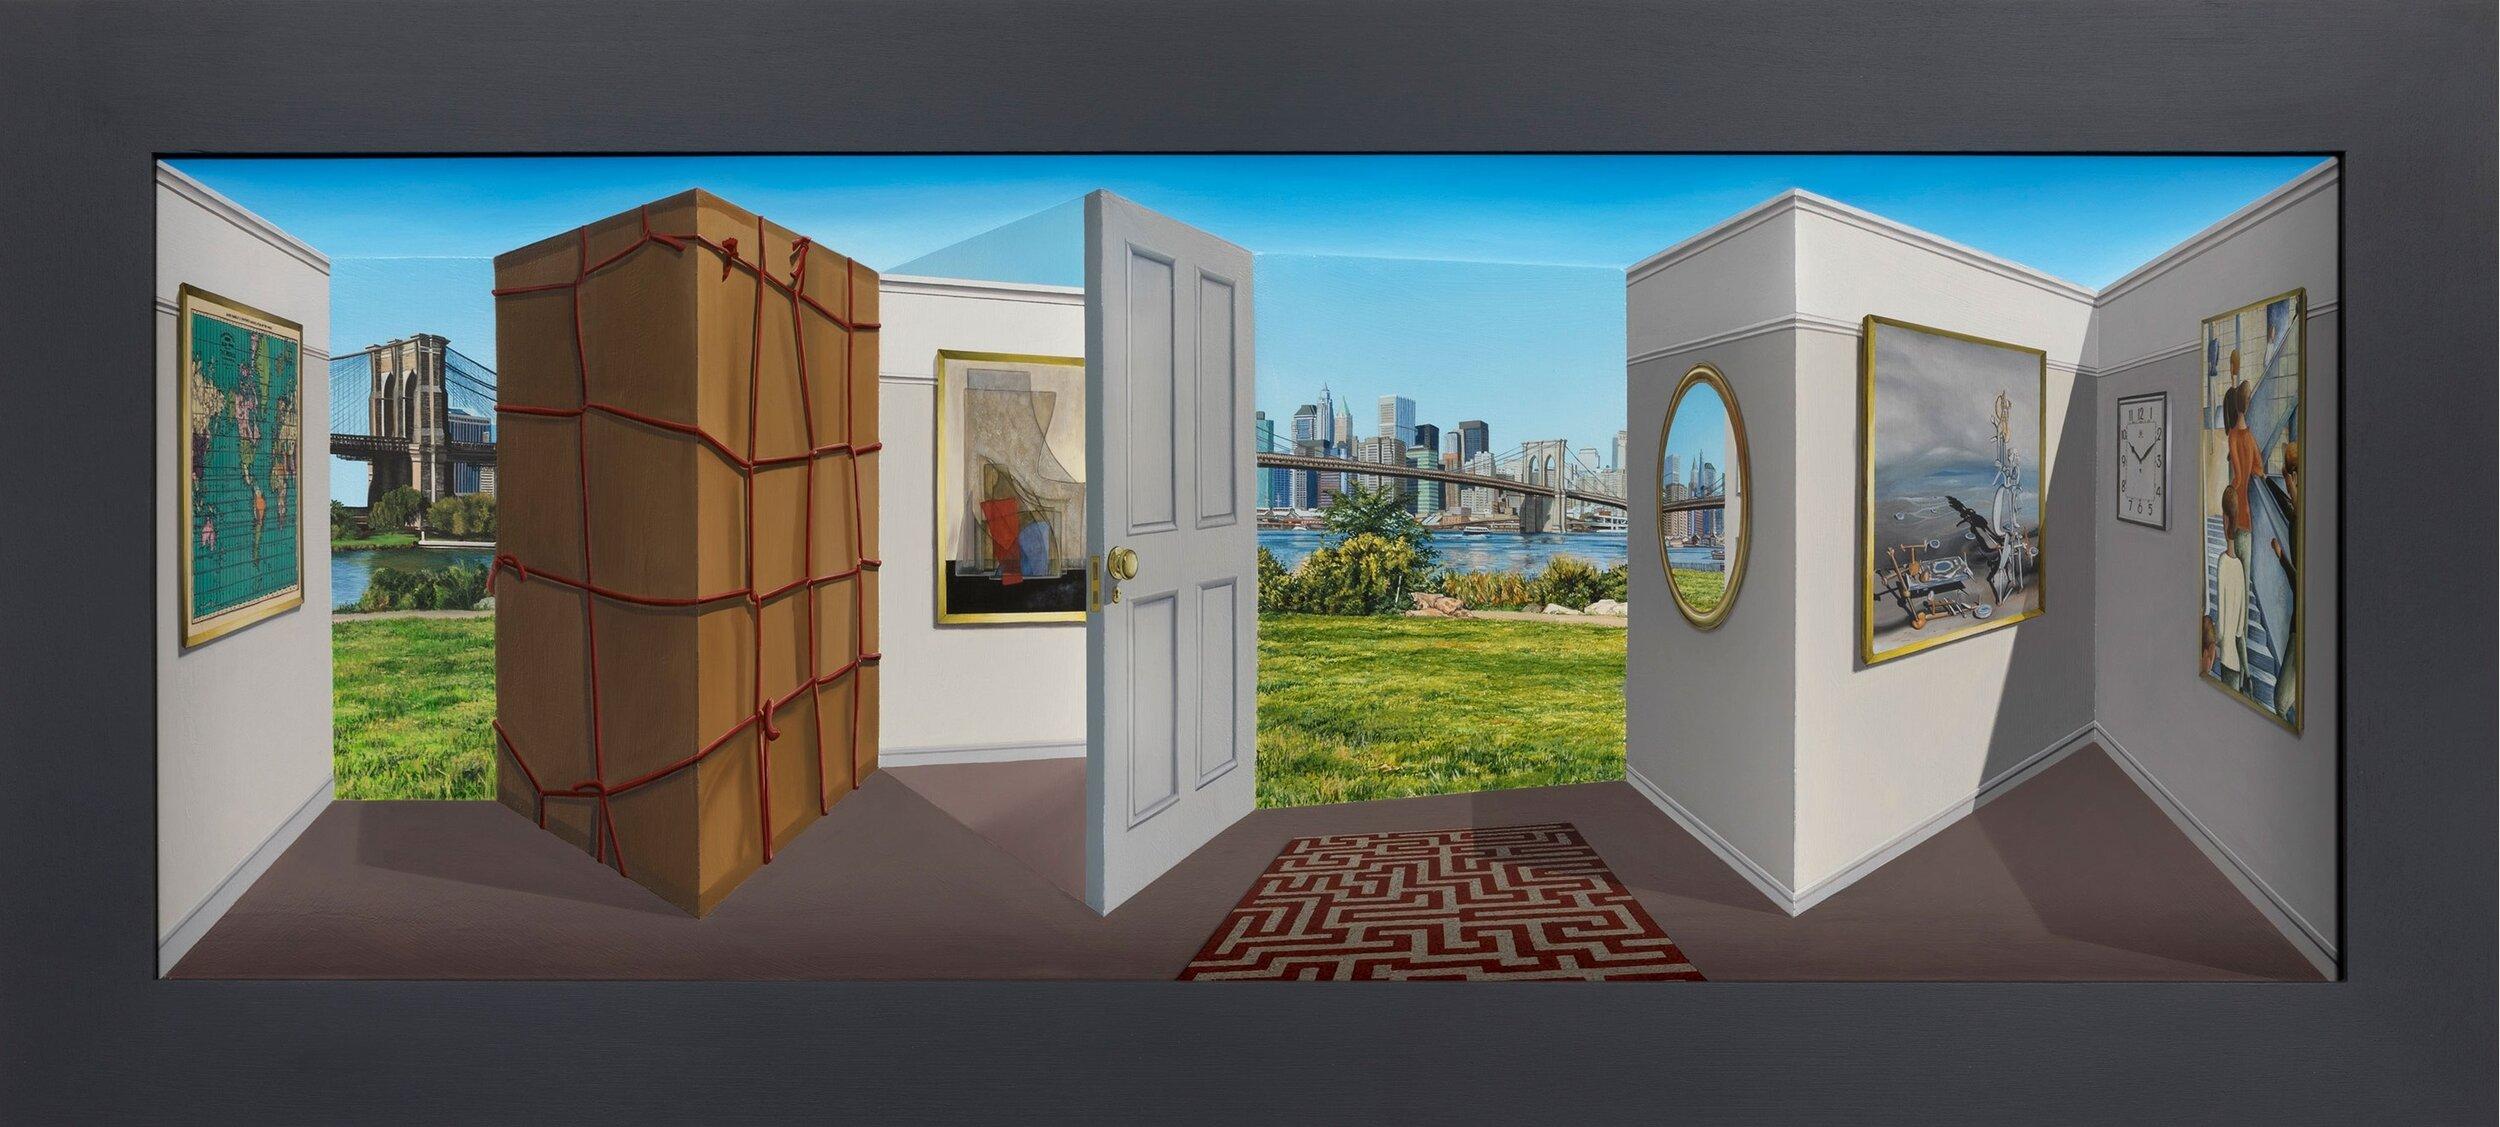 A Cardboard Box,  2019 Oil on board construction 22 1/2 x 53 3/4 x 5 3/4 inches